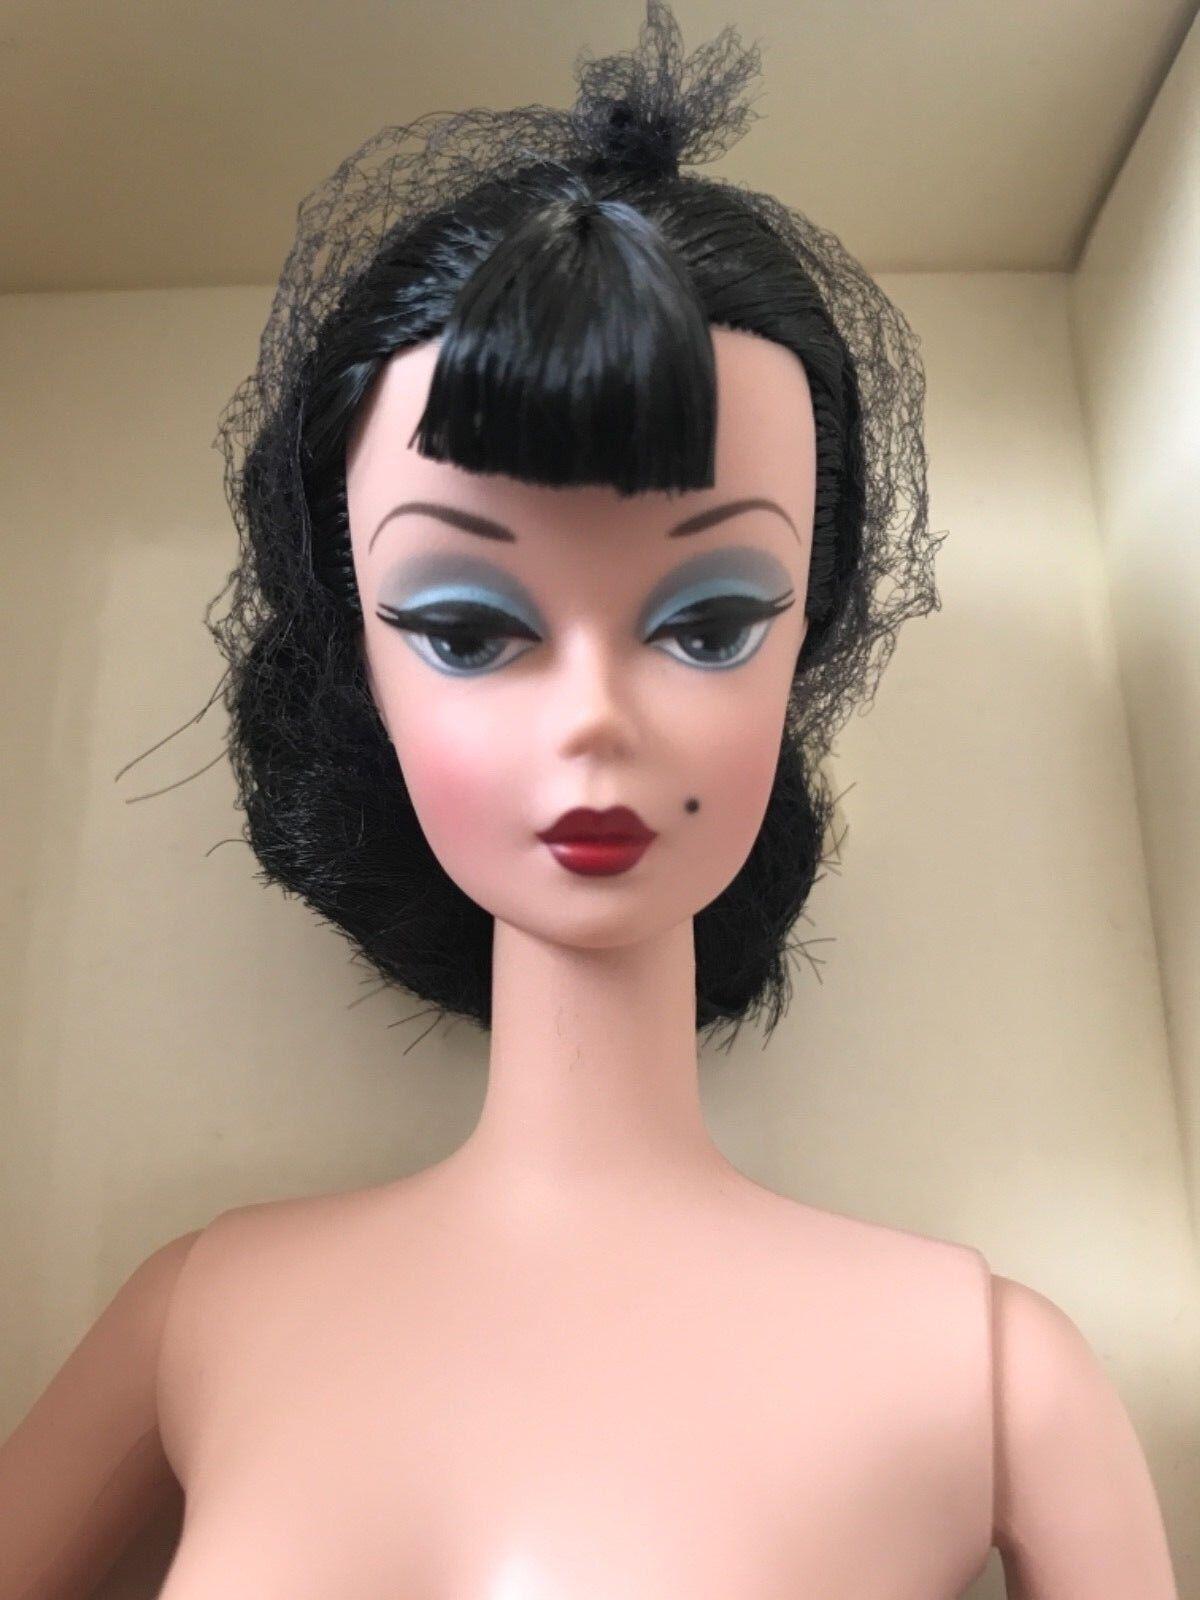 Barbie bfmc Fashion Designer Silkstone desnuda en caja de la FAO LMT ED w cert. de autenticidad & Pulsera Tag